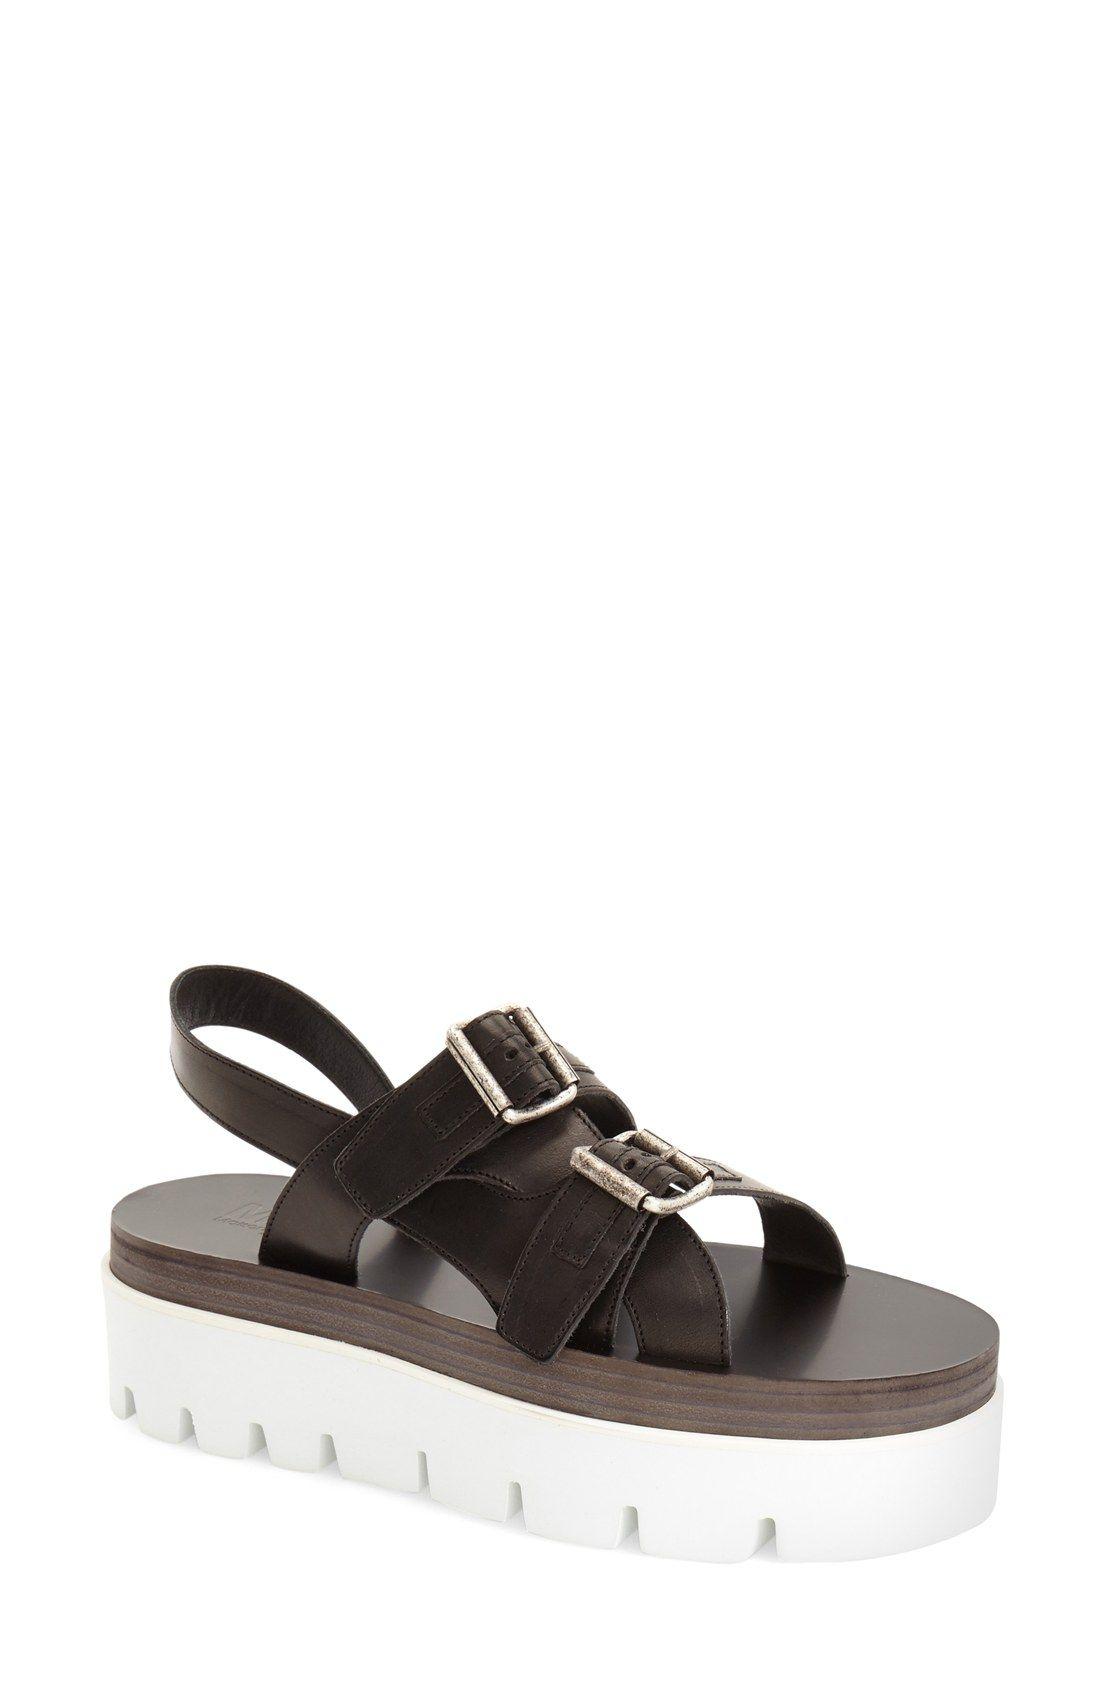 f0b4b83bf5c Black Leather · Nordstrom · MM6 Maison Margiela Strappy Platform Sandal  (Women)